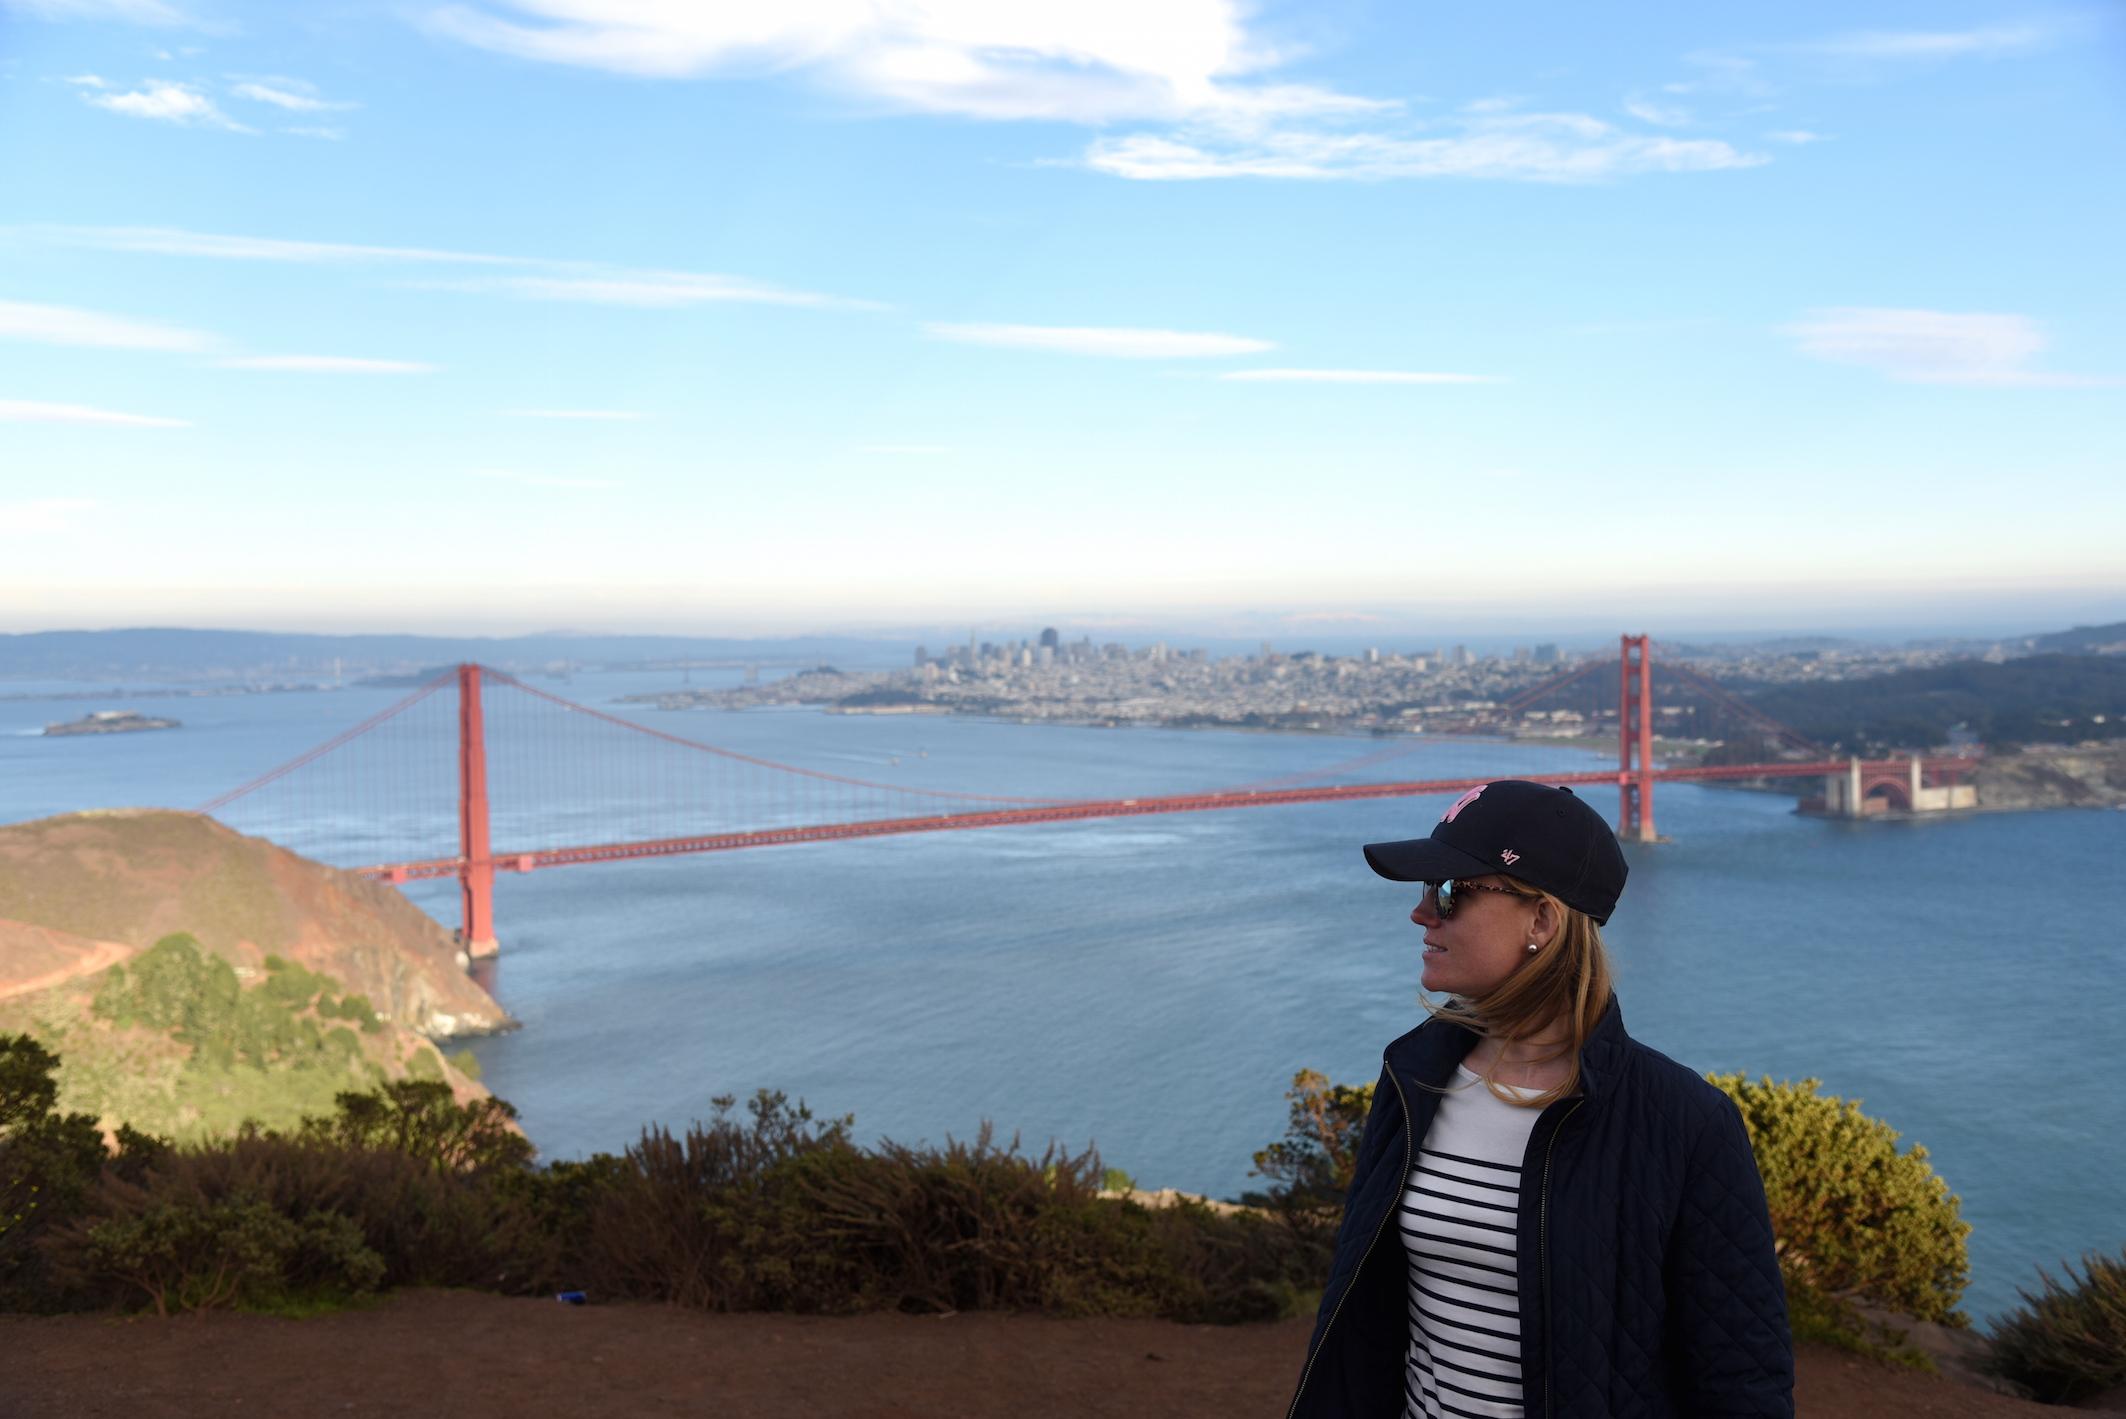 Fashion Lifestyle Travel blogger visiting San Francisco